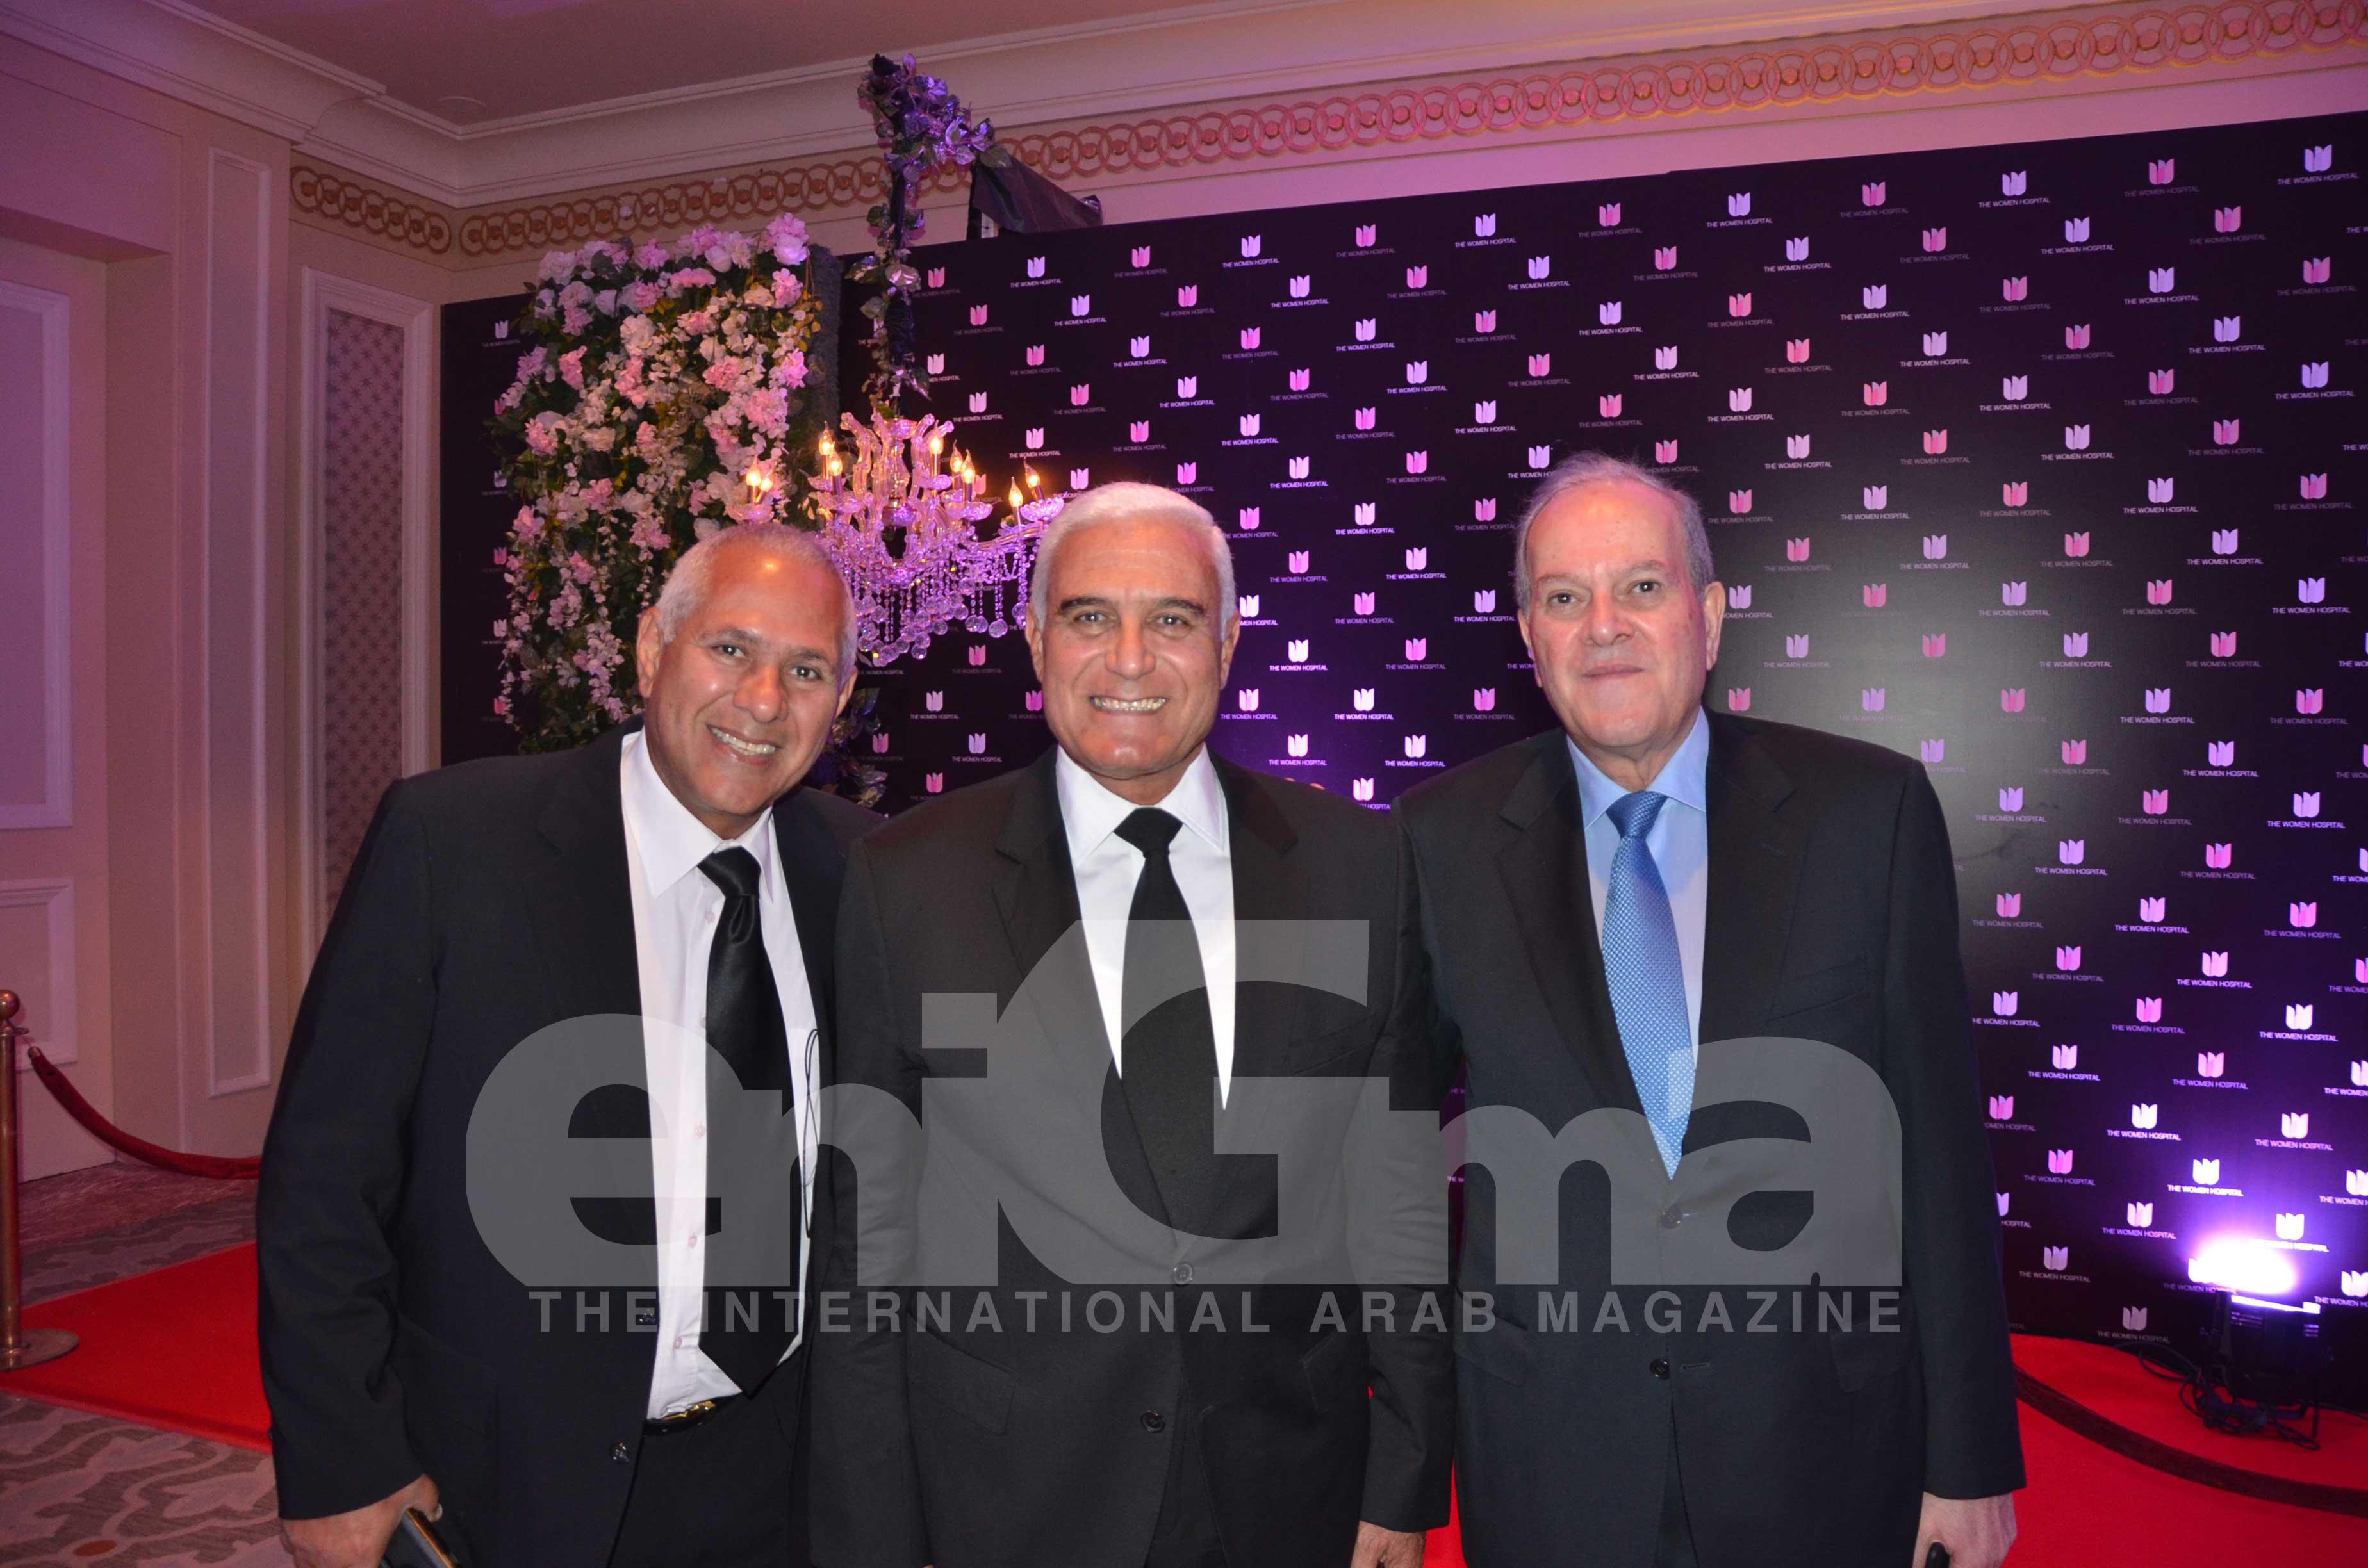 Mr. Karim Garranah, Mr. Mourad Mowafy & Mr. Hady Amer